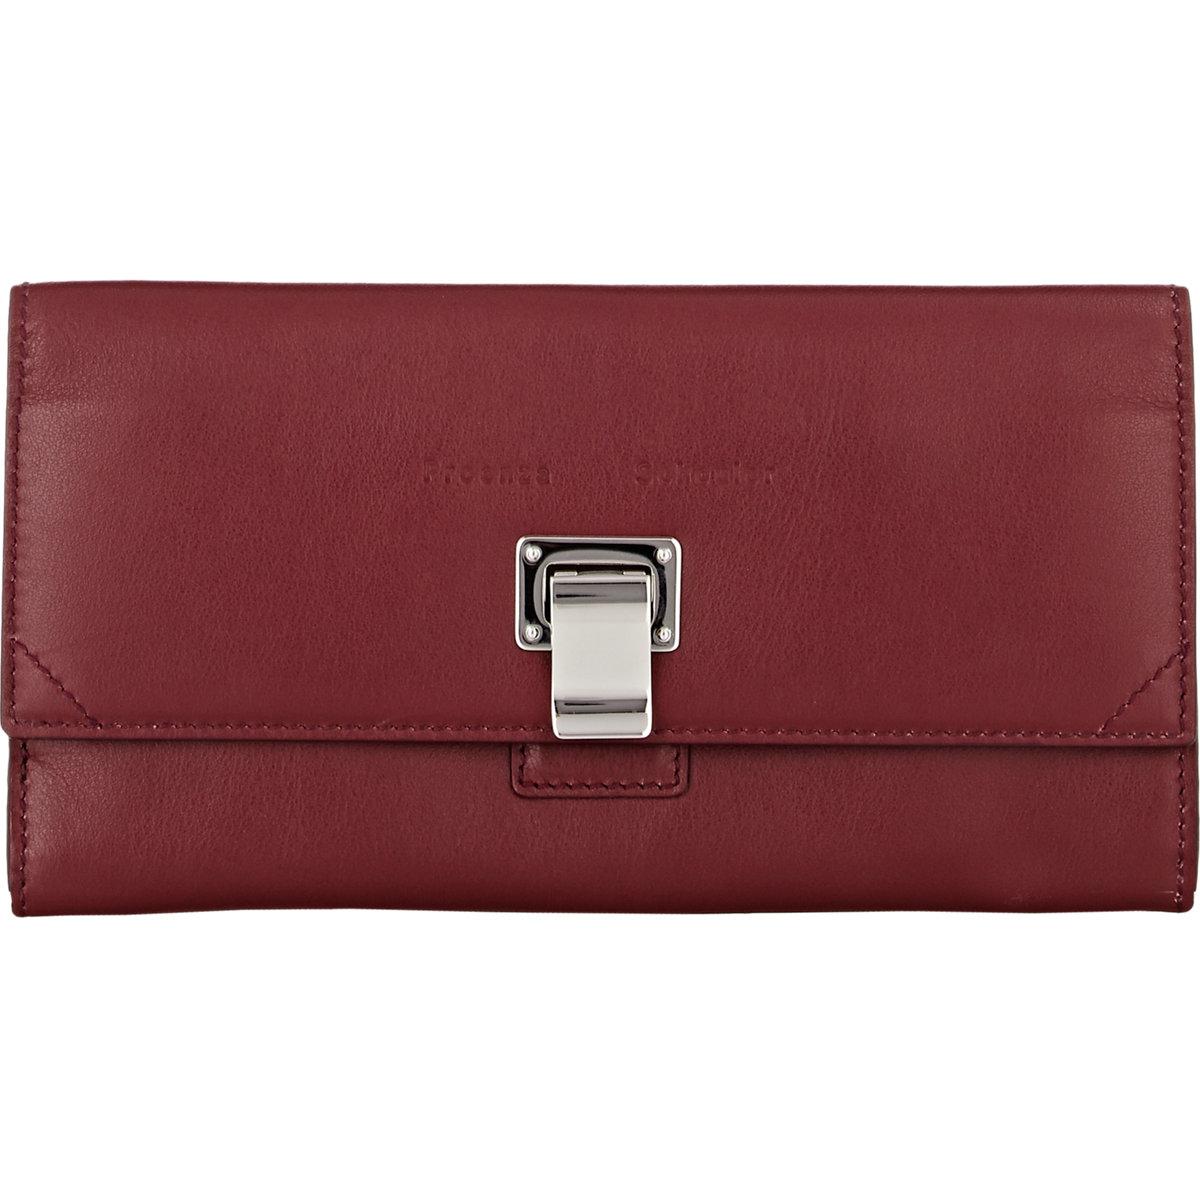 Continental Leather Wallet Proenza Schouler 1iiYu